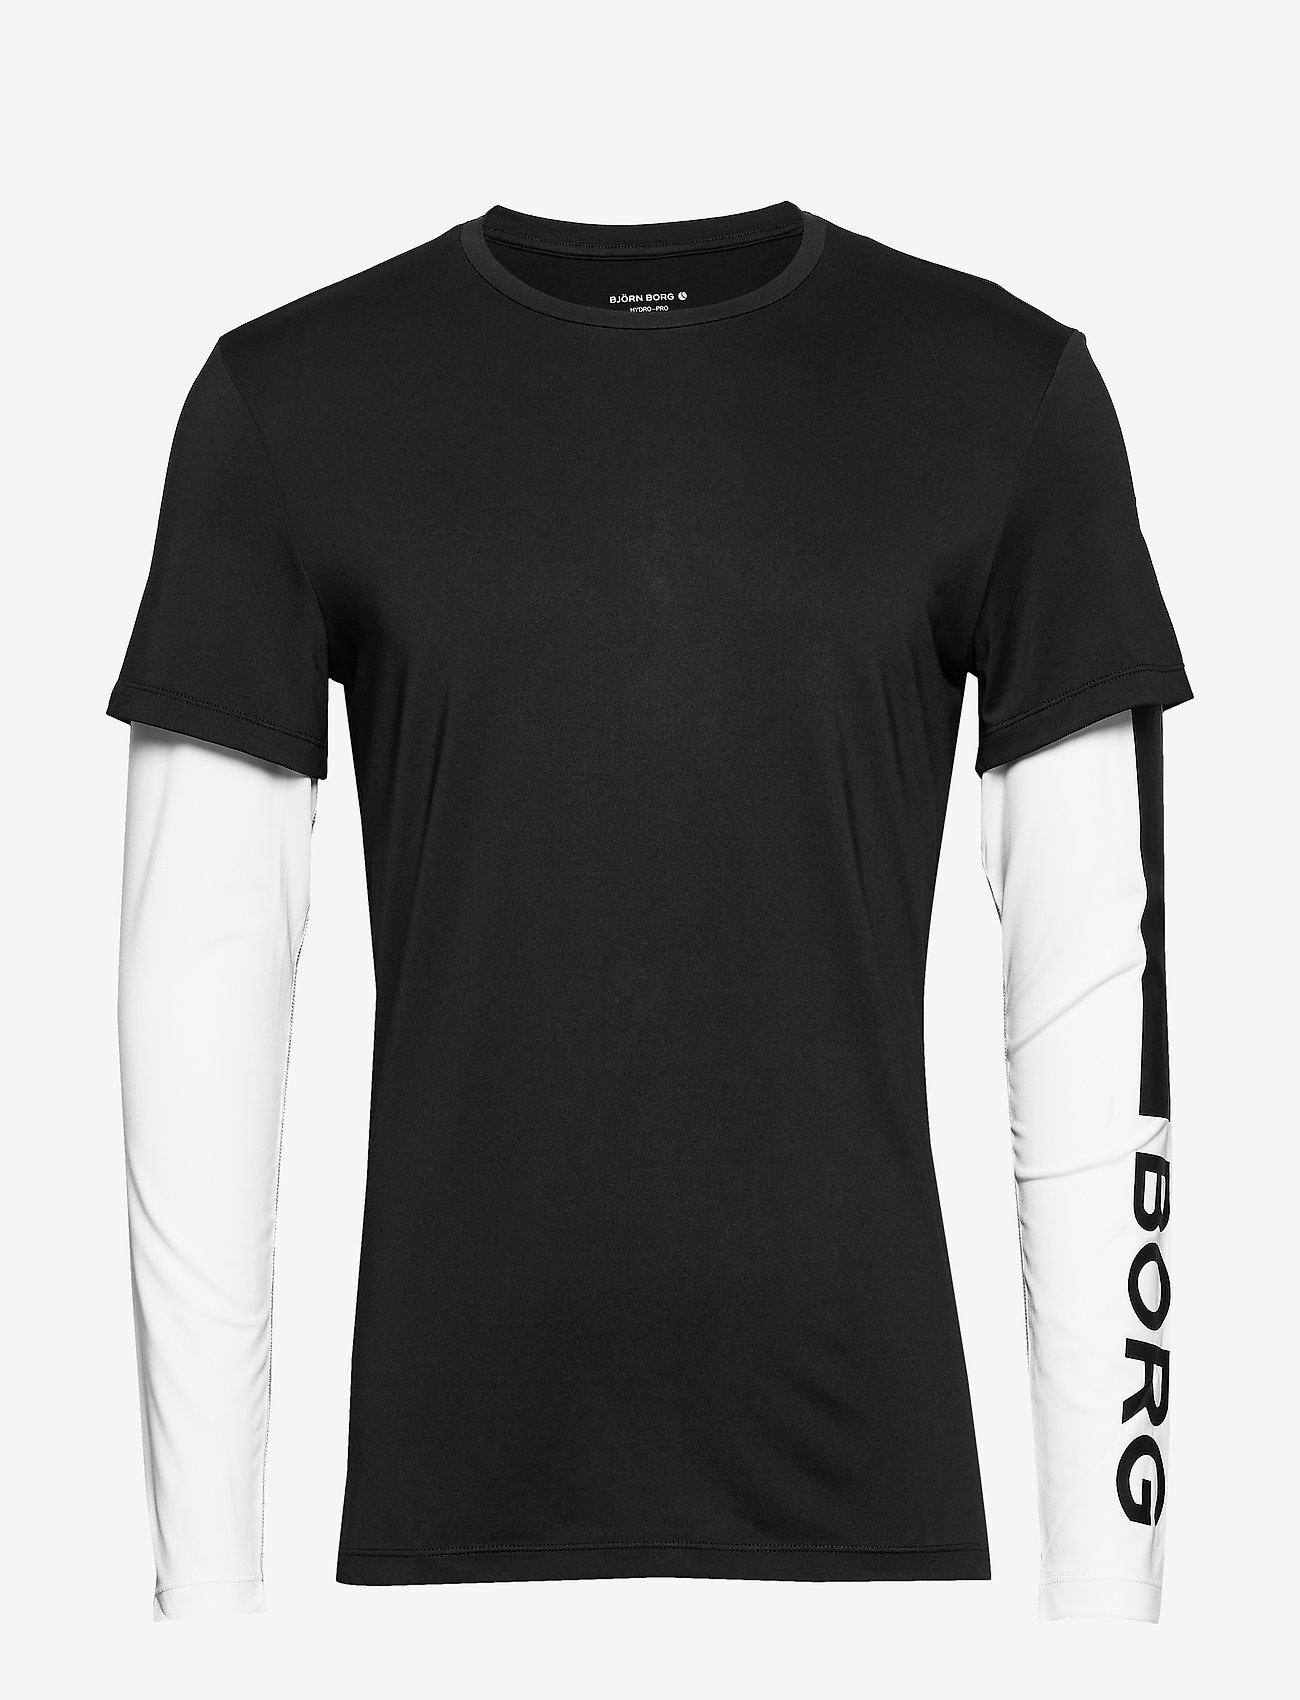 Björn Borg - LS TEE ABER ABER - langarmshirts - black beauty - 0